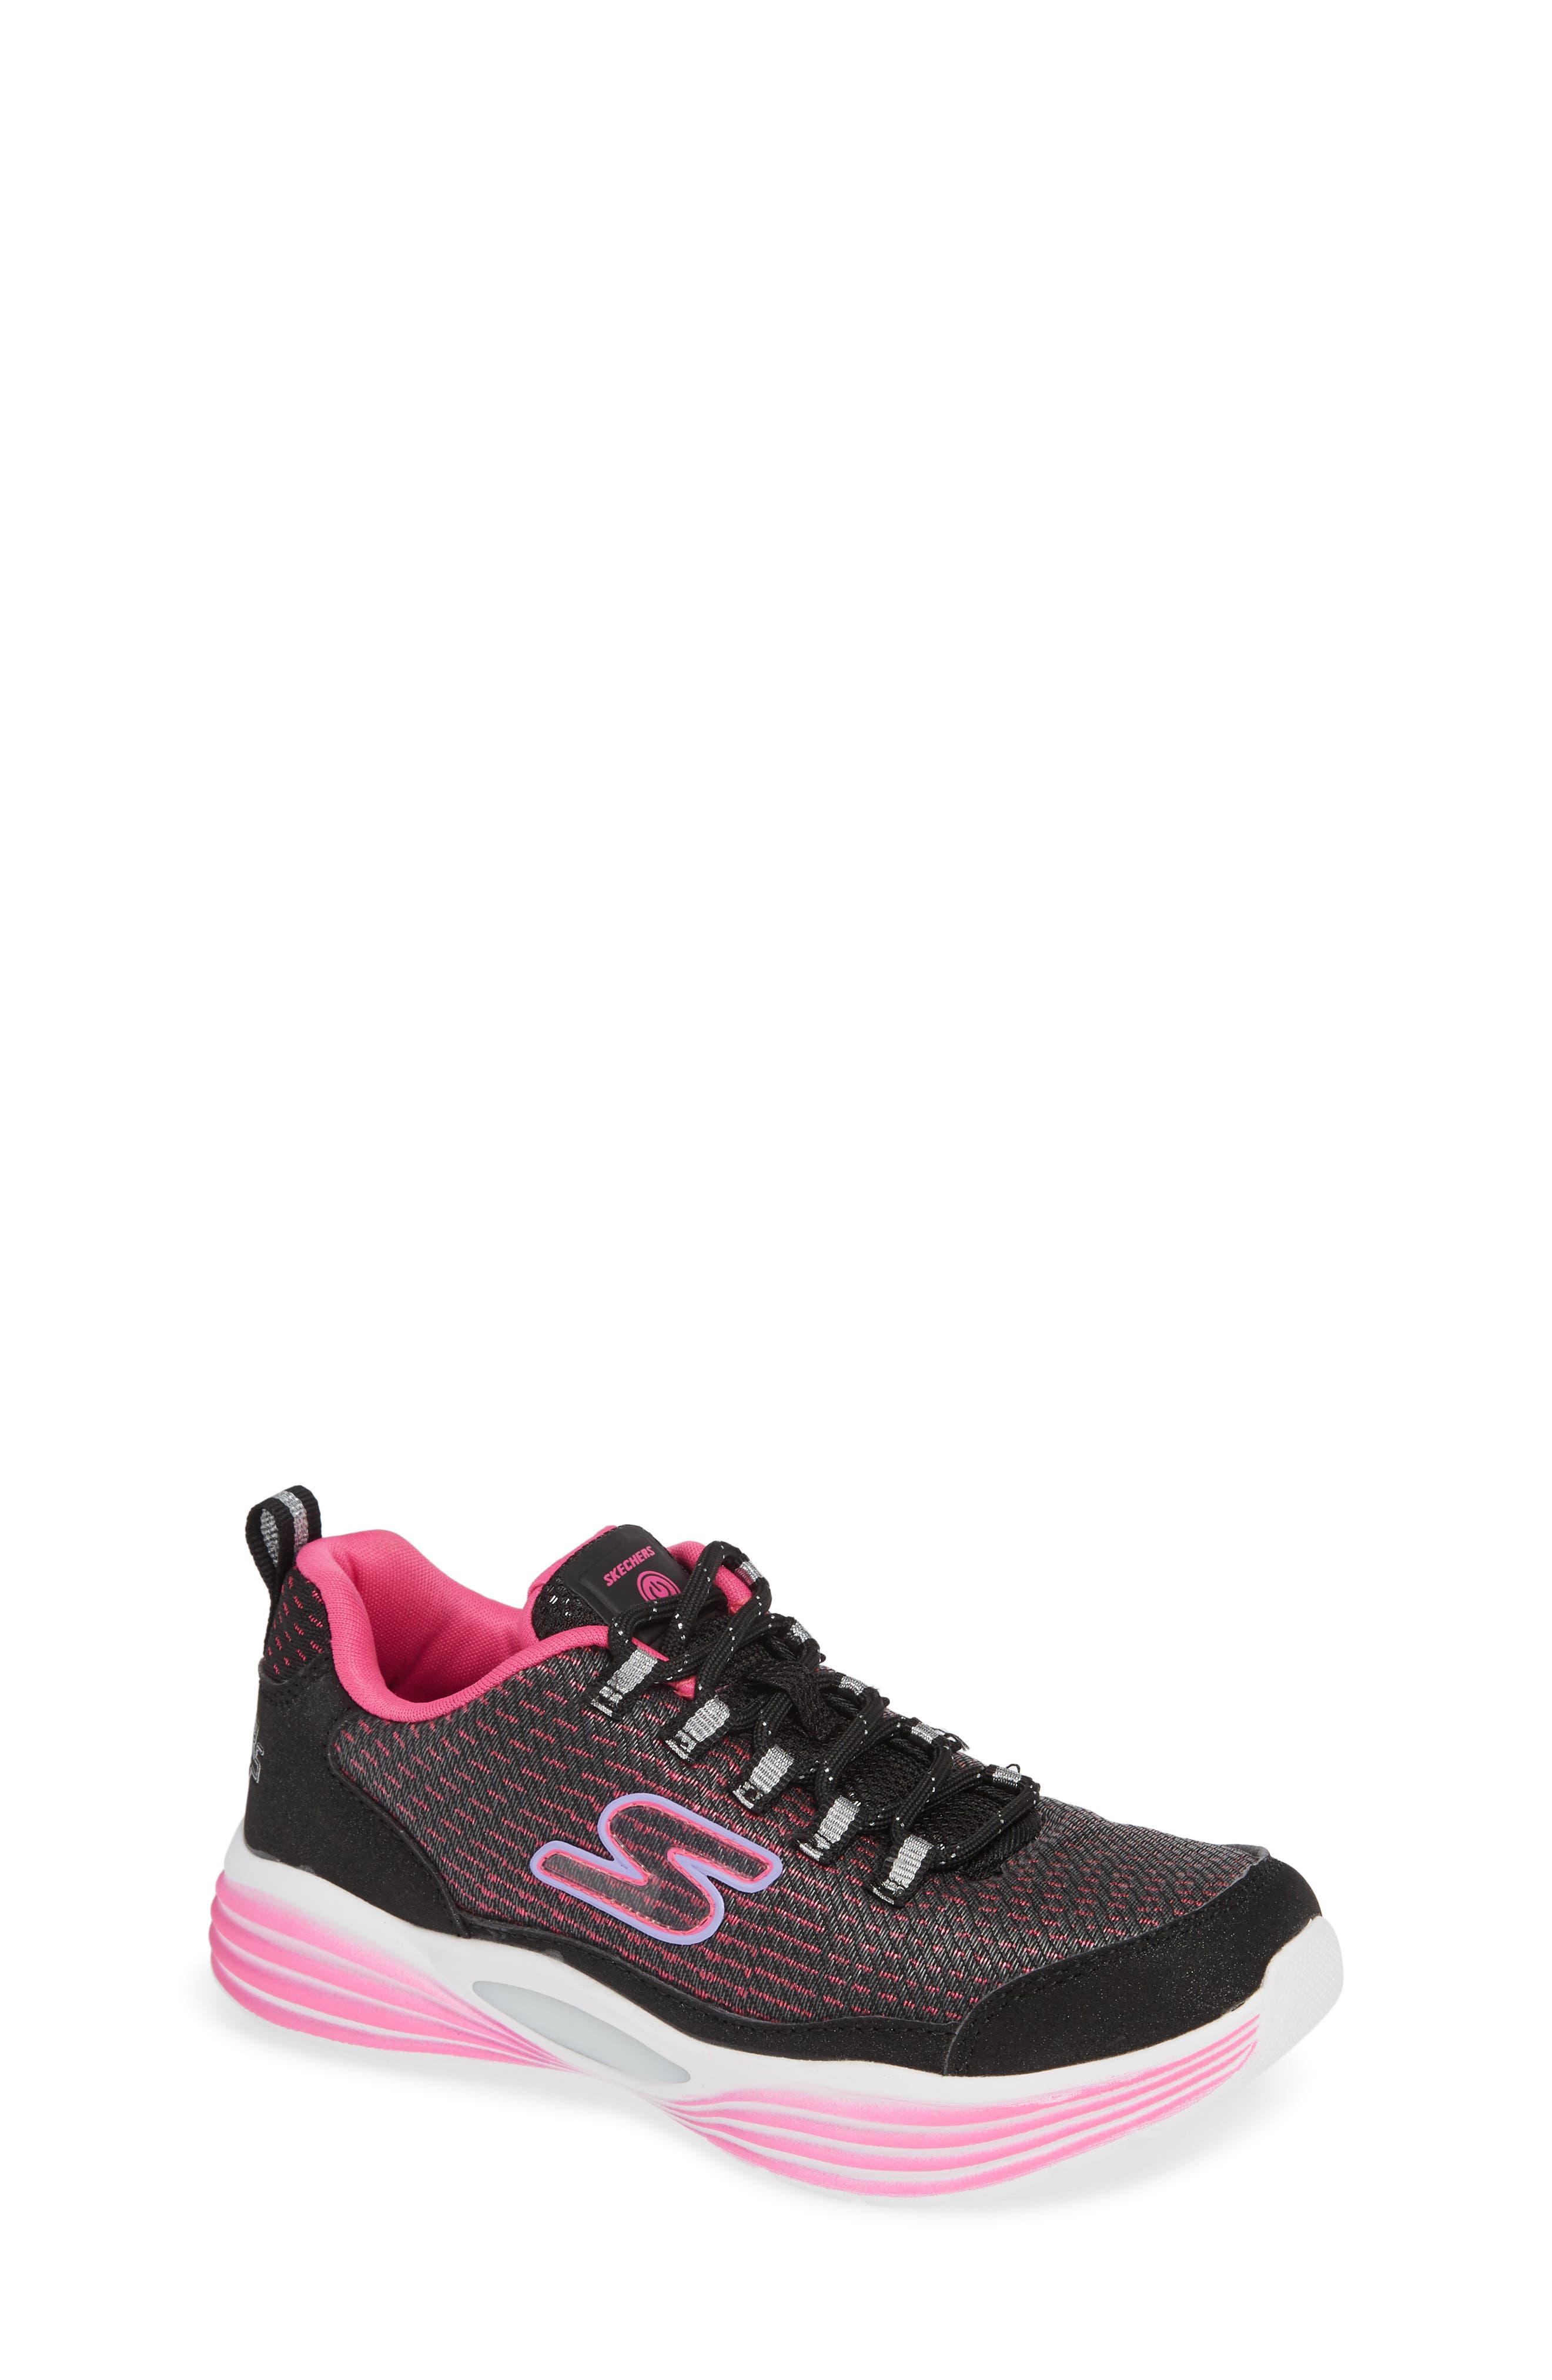 Luminator Light Up Sneaker,                         Main,                         color, BLACK/ PINK